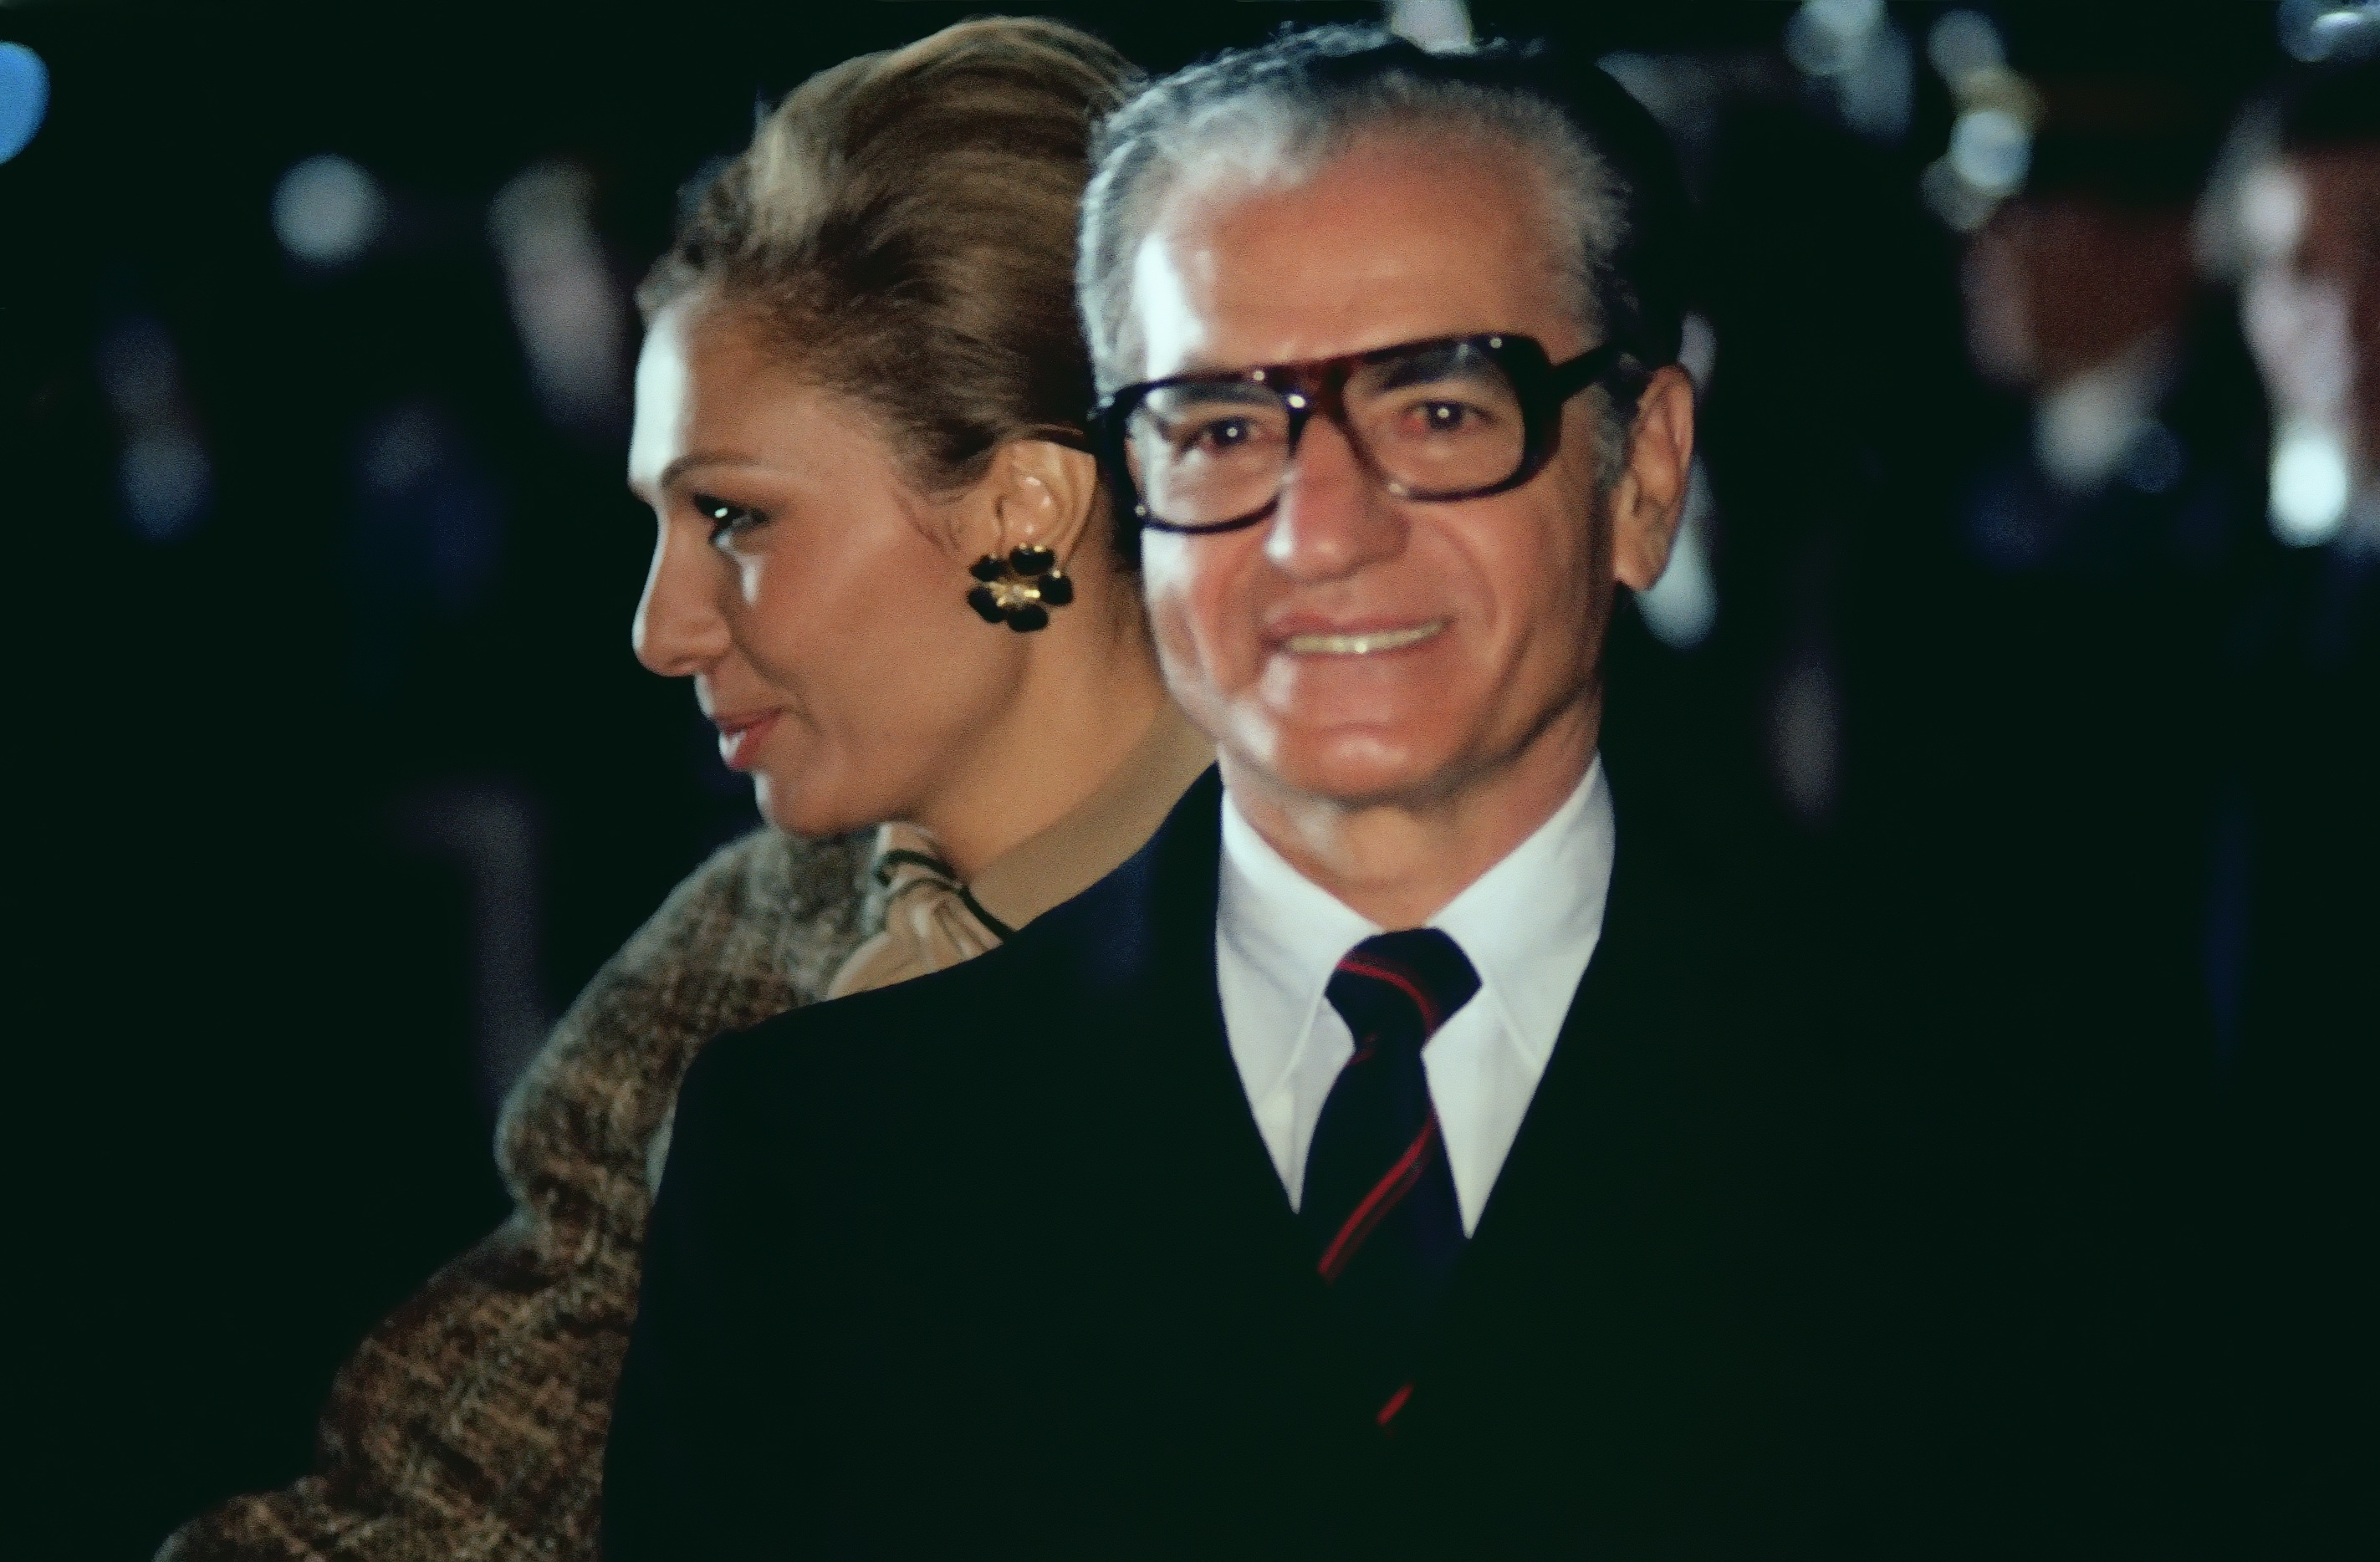 Schah Mohammad Reza Pahlavi und Schahbanu Farah Pahlavi, 1977